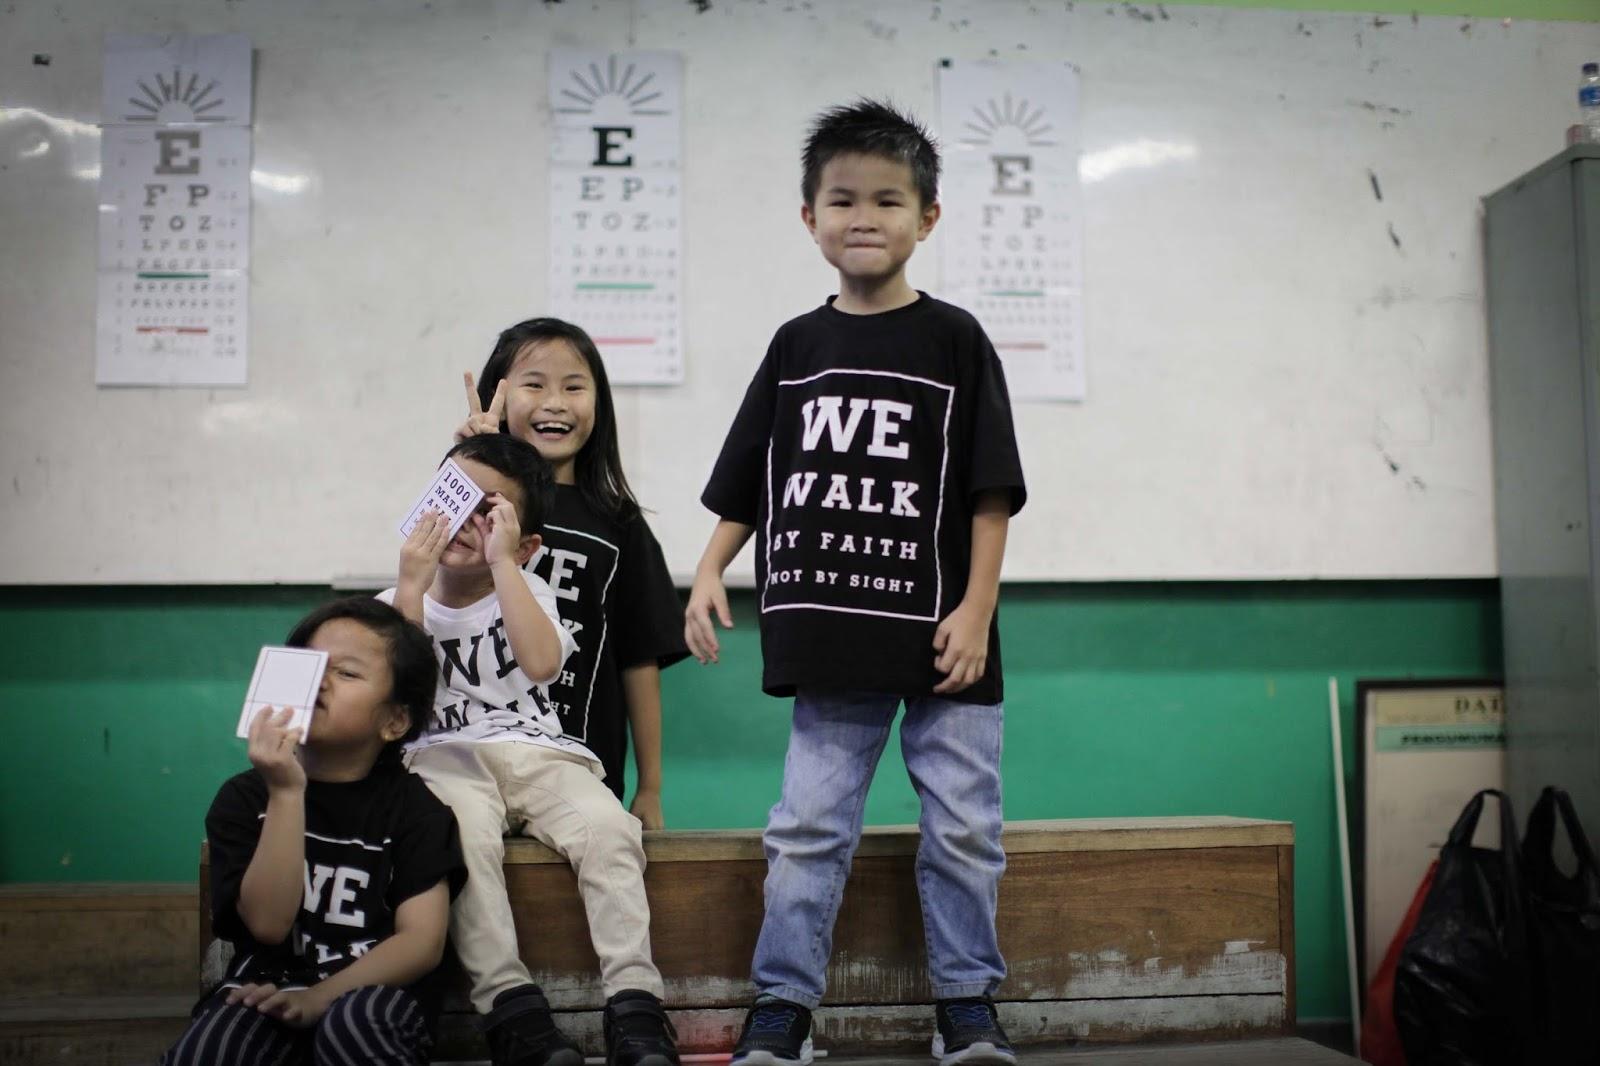 Bakti Sosial IX - 1000 Mata Anak Bangsa Melihat Terang - Kampung Duri image